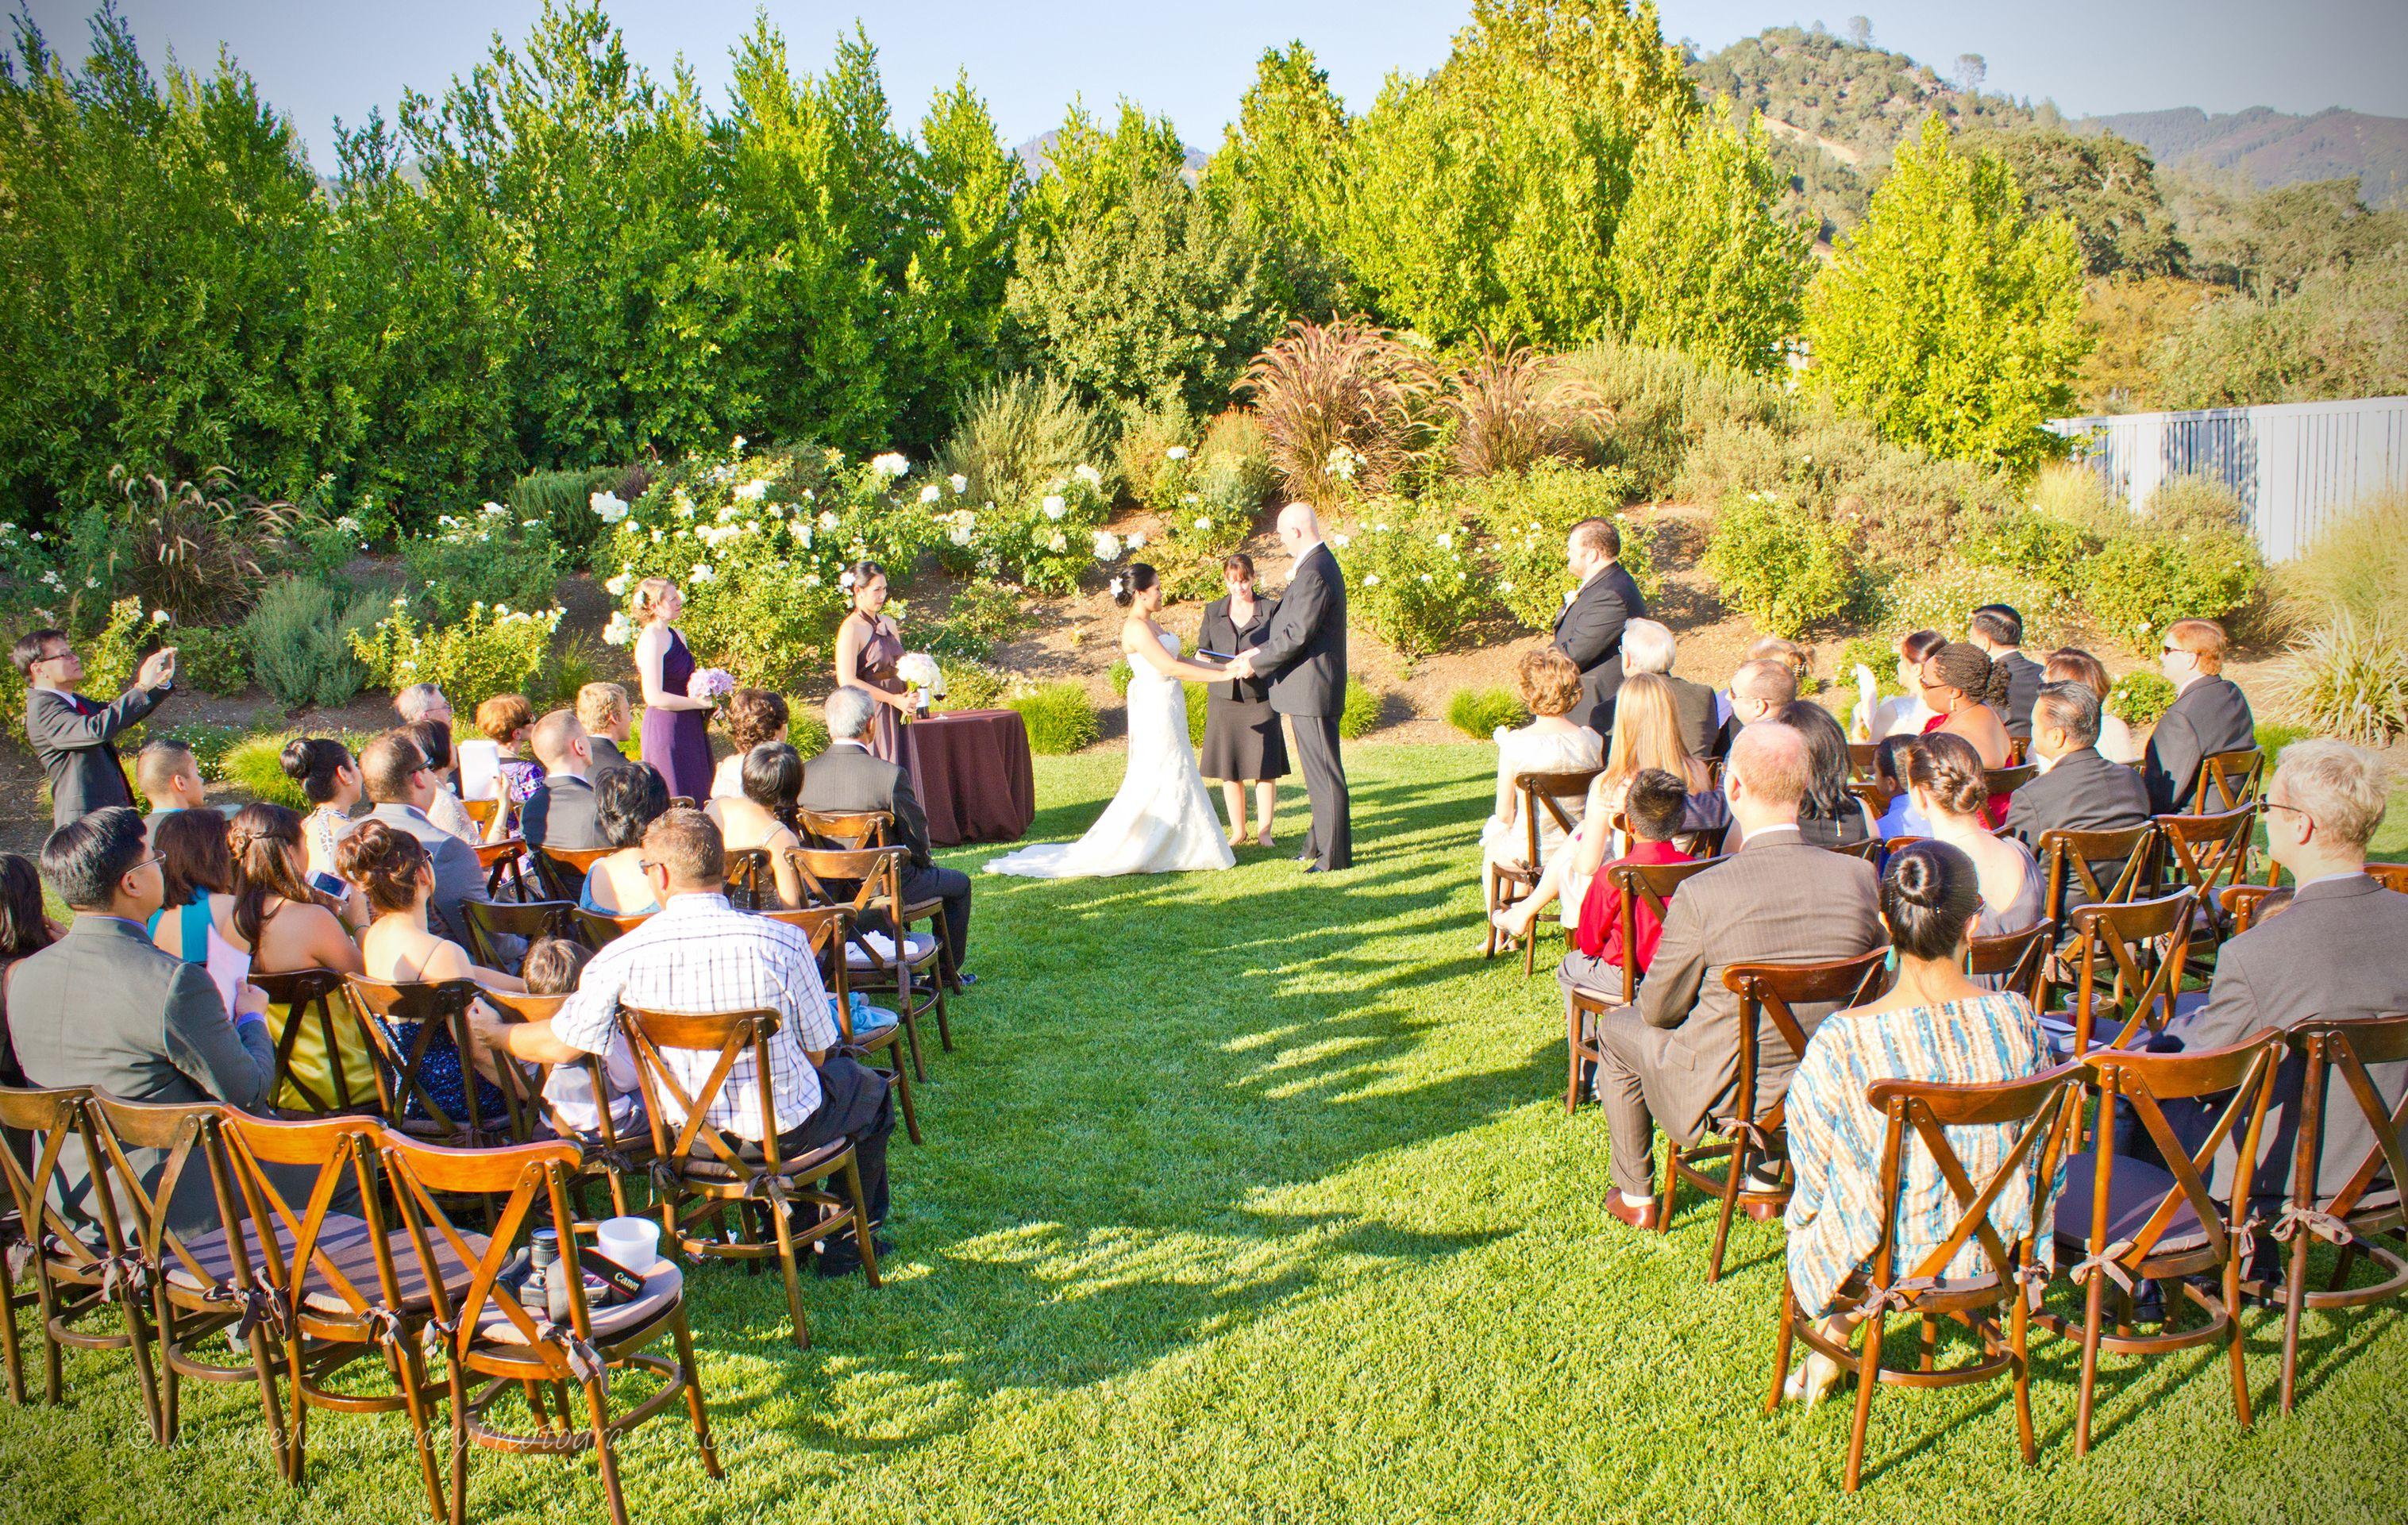 Wine country wedding at solage calistoga calistoga ca north of